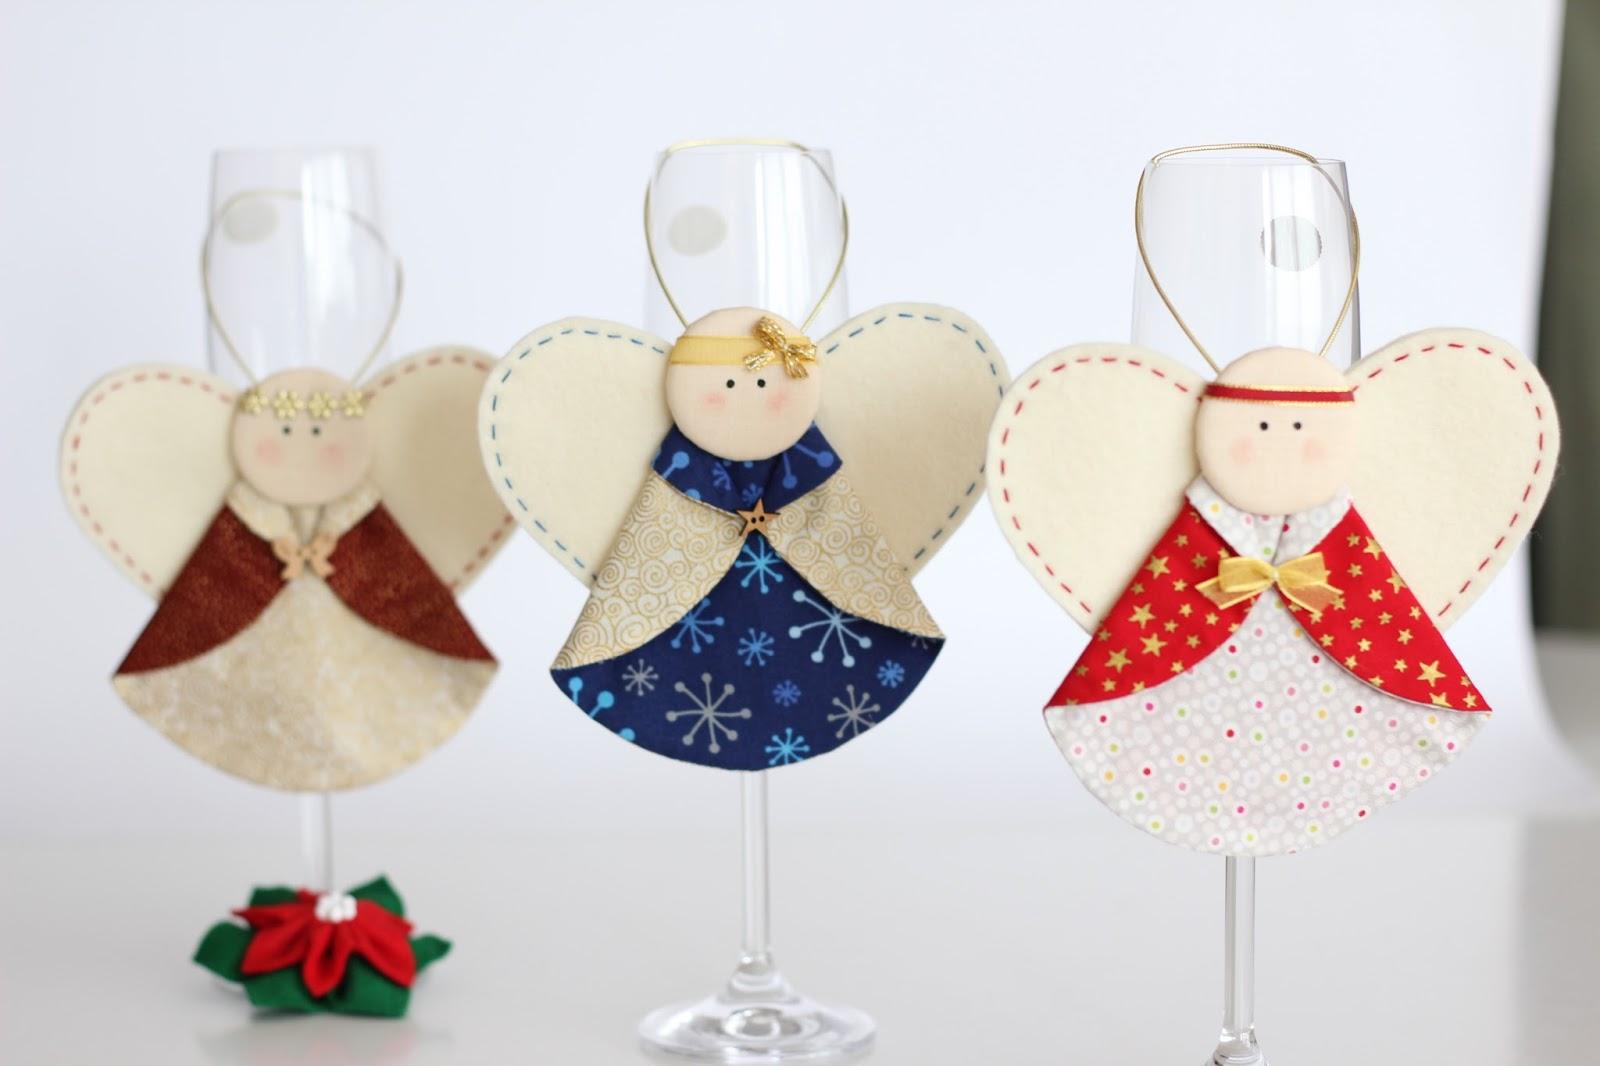 Mi hogar de patchwork angeles de navidad - Angeles de navidad manualidades ...